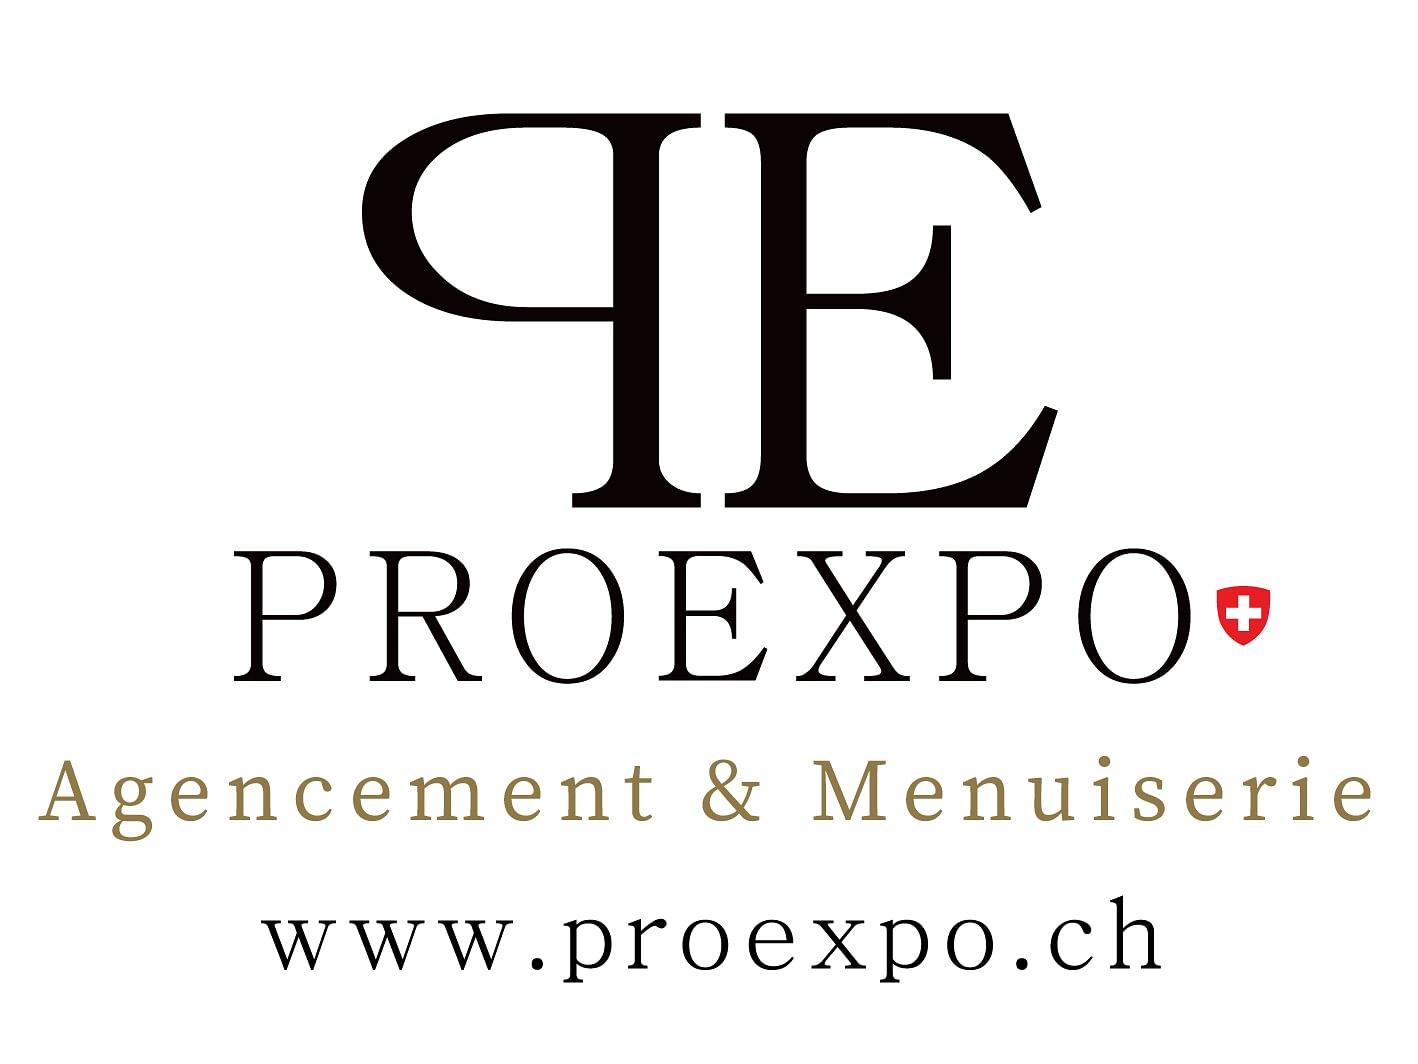 Proexpo - Atelier de menuiserie